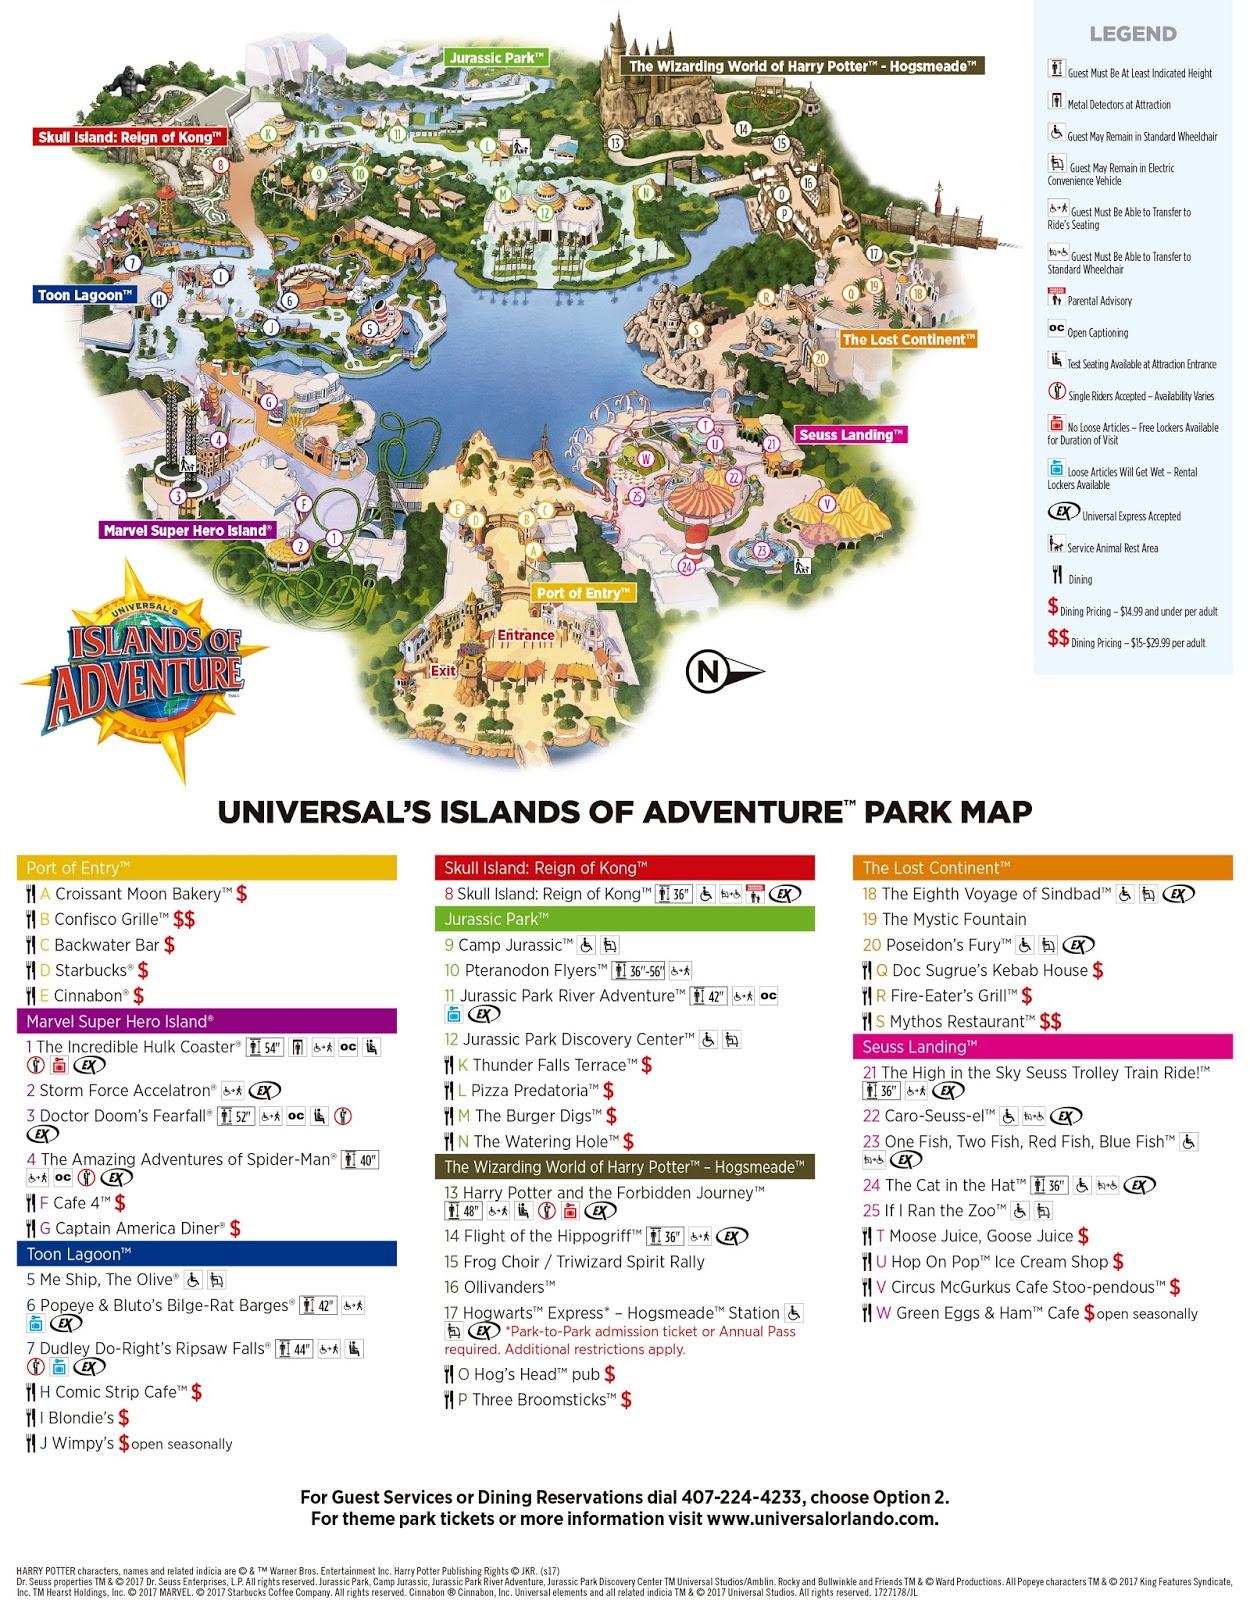 Mapa Universal's Islands of Adventure